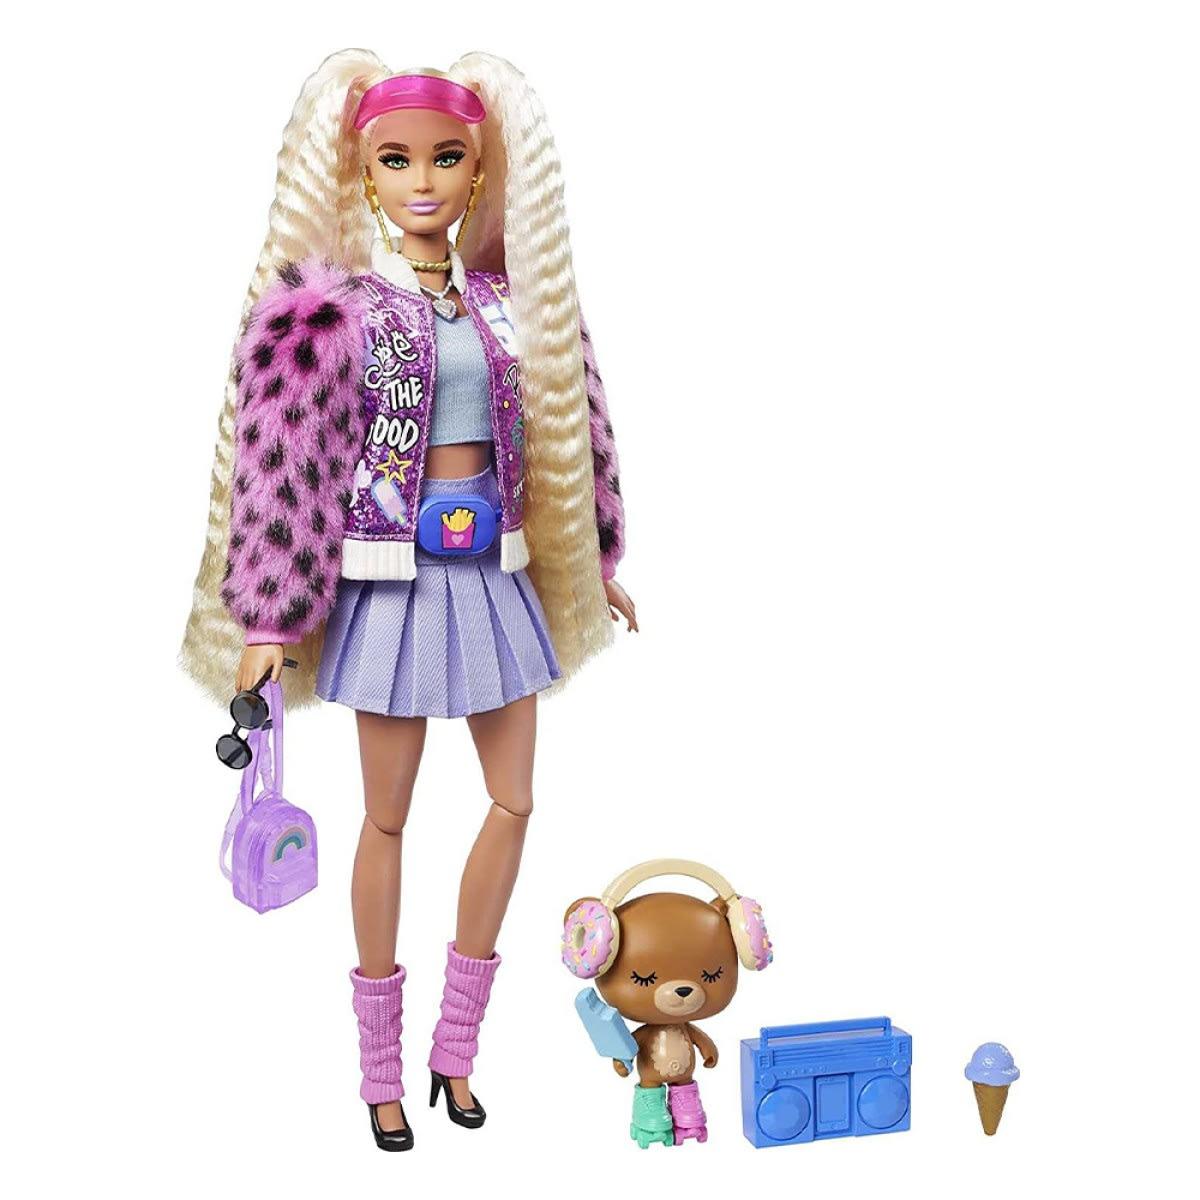 Barbie Extra - Blonde Pigtails MATTEL (GYJ77)